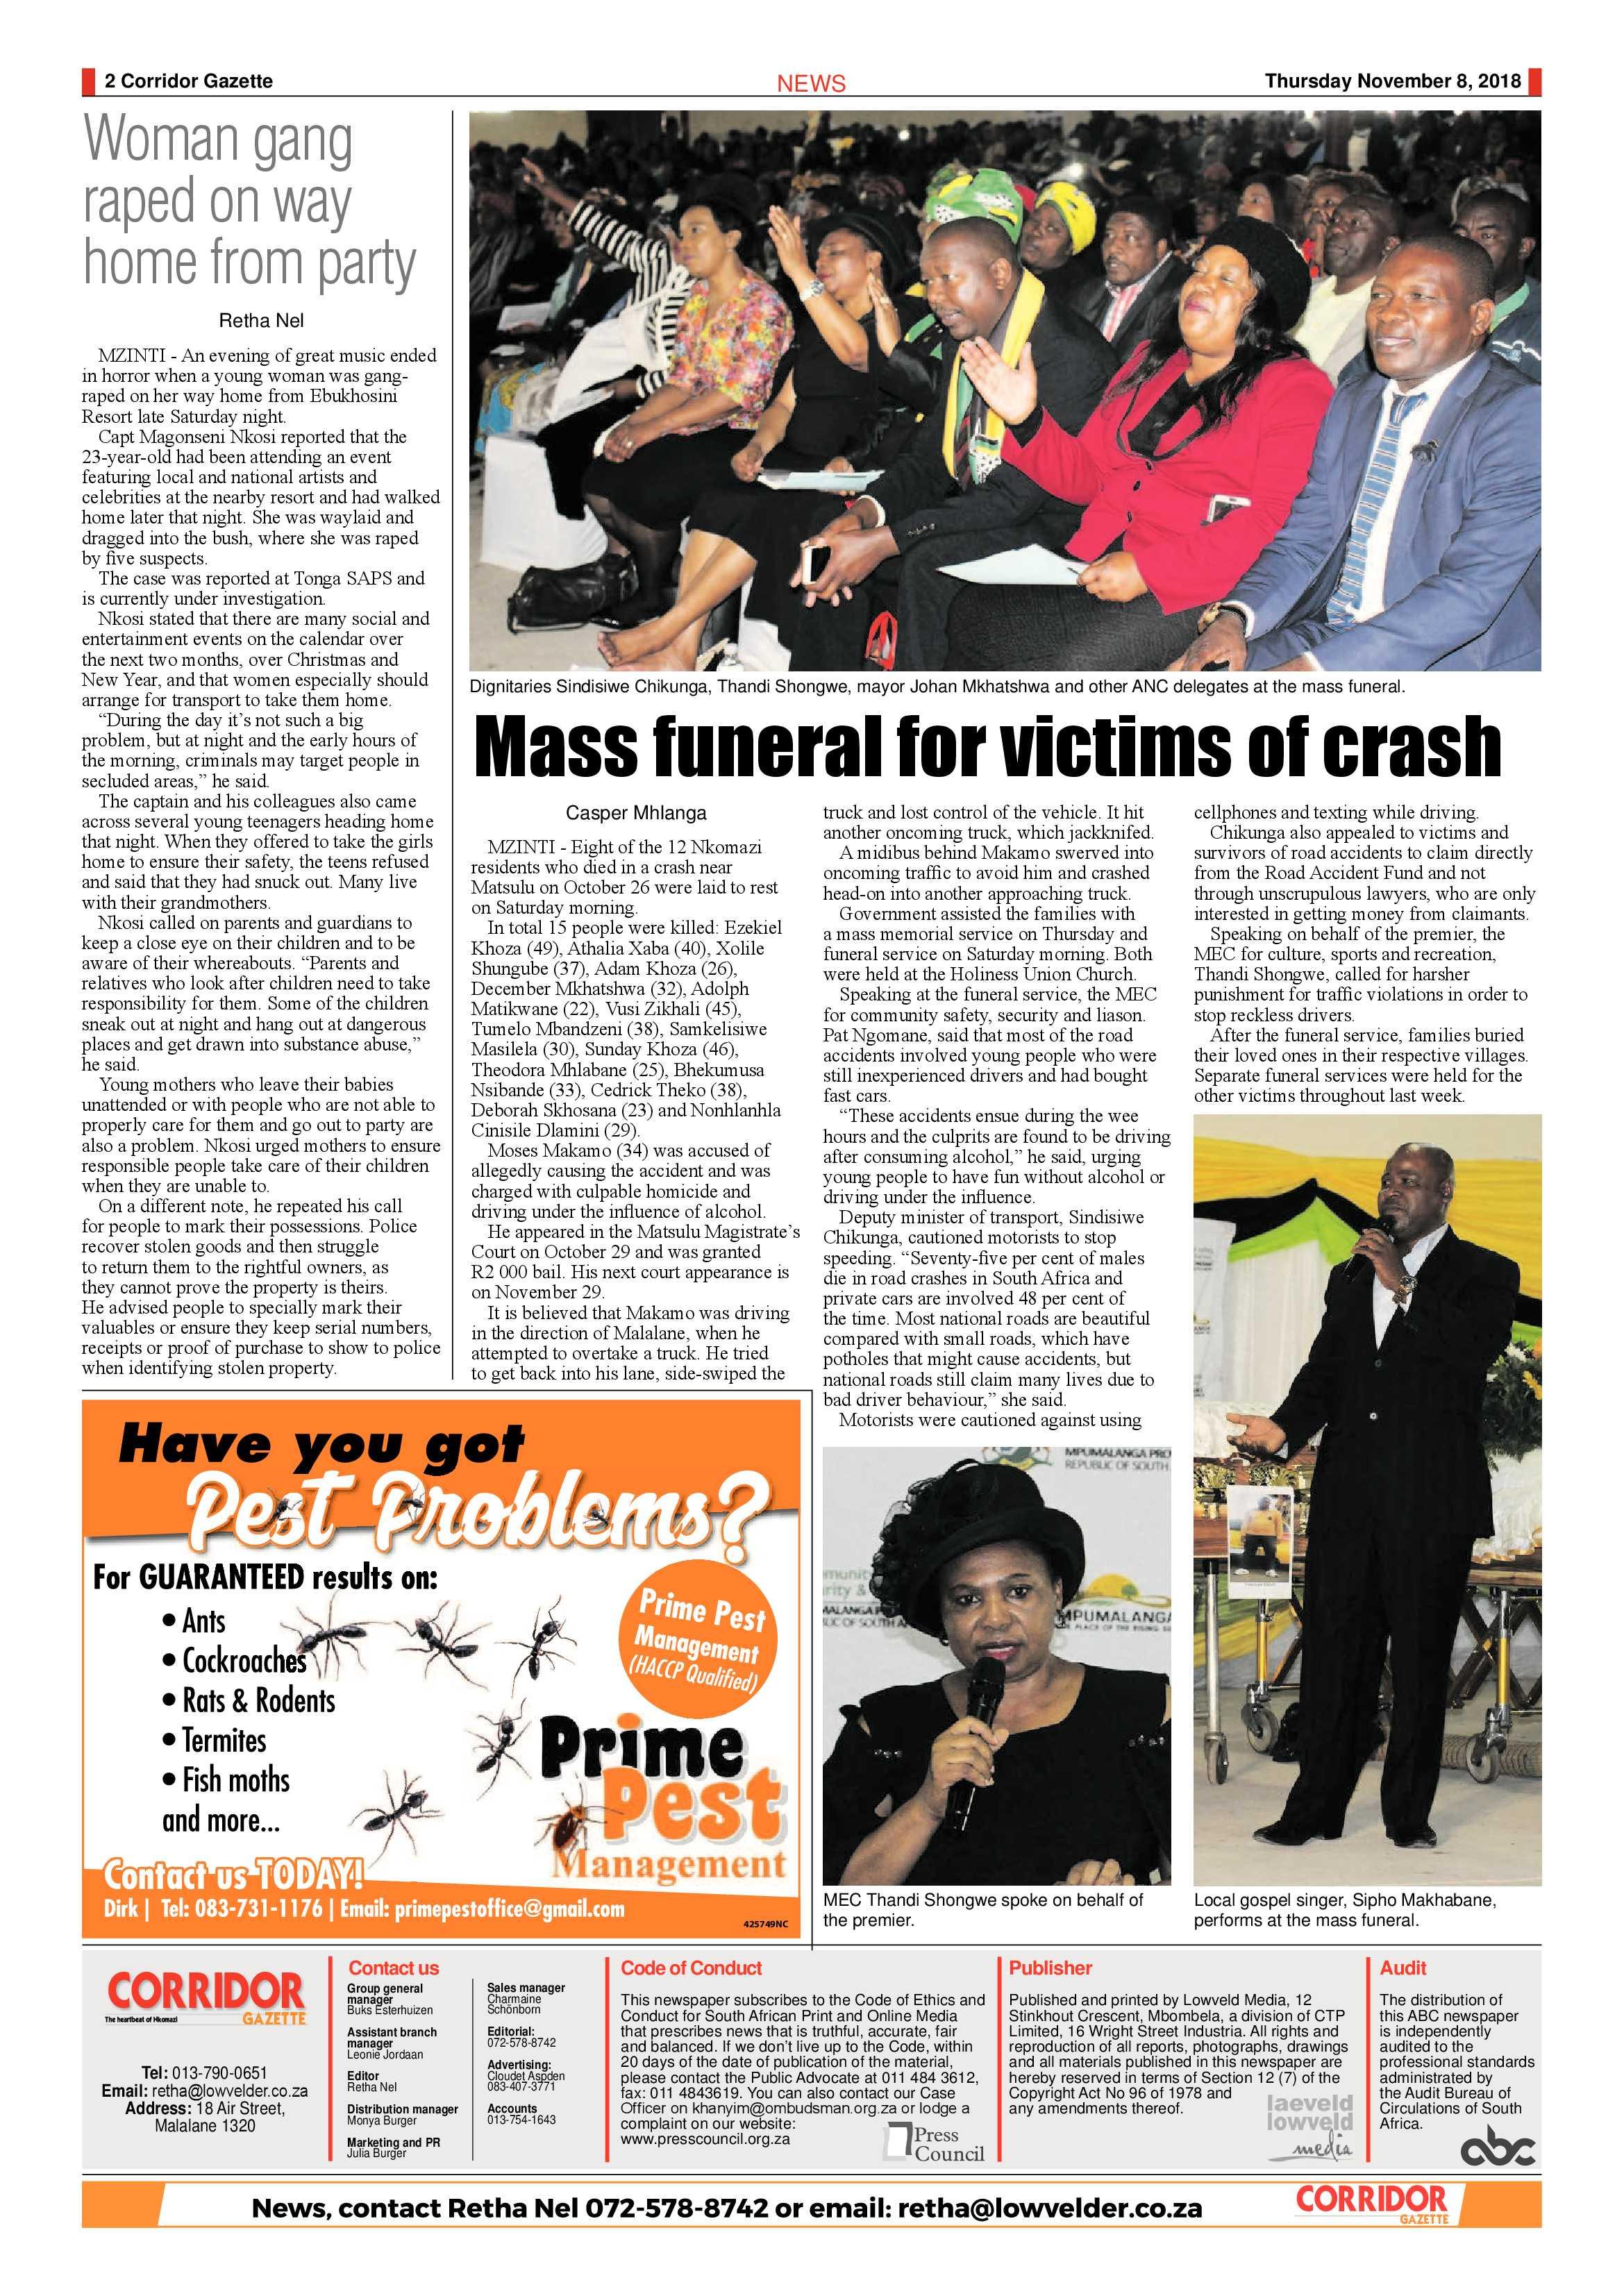 corridor-gazette-8-november-2018-epapers-page-2